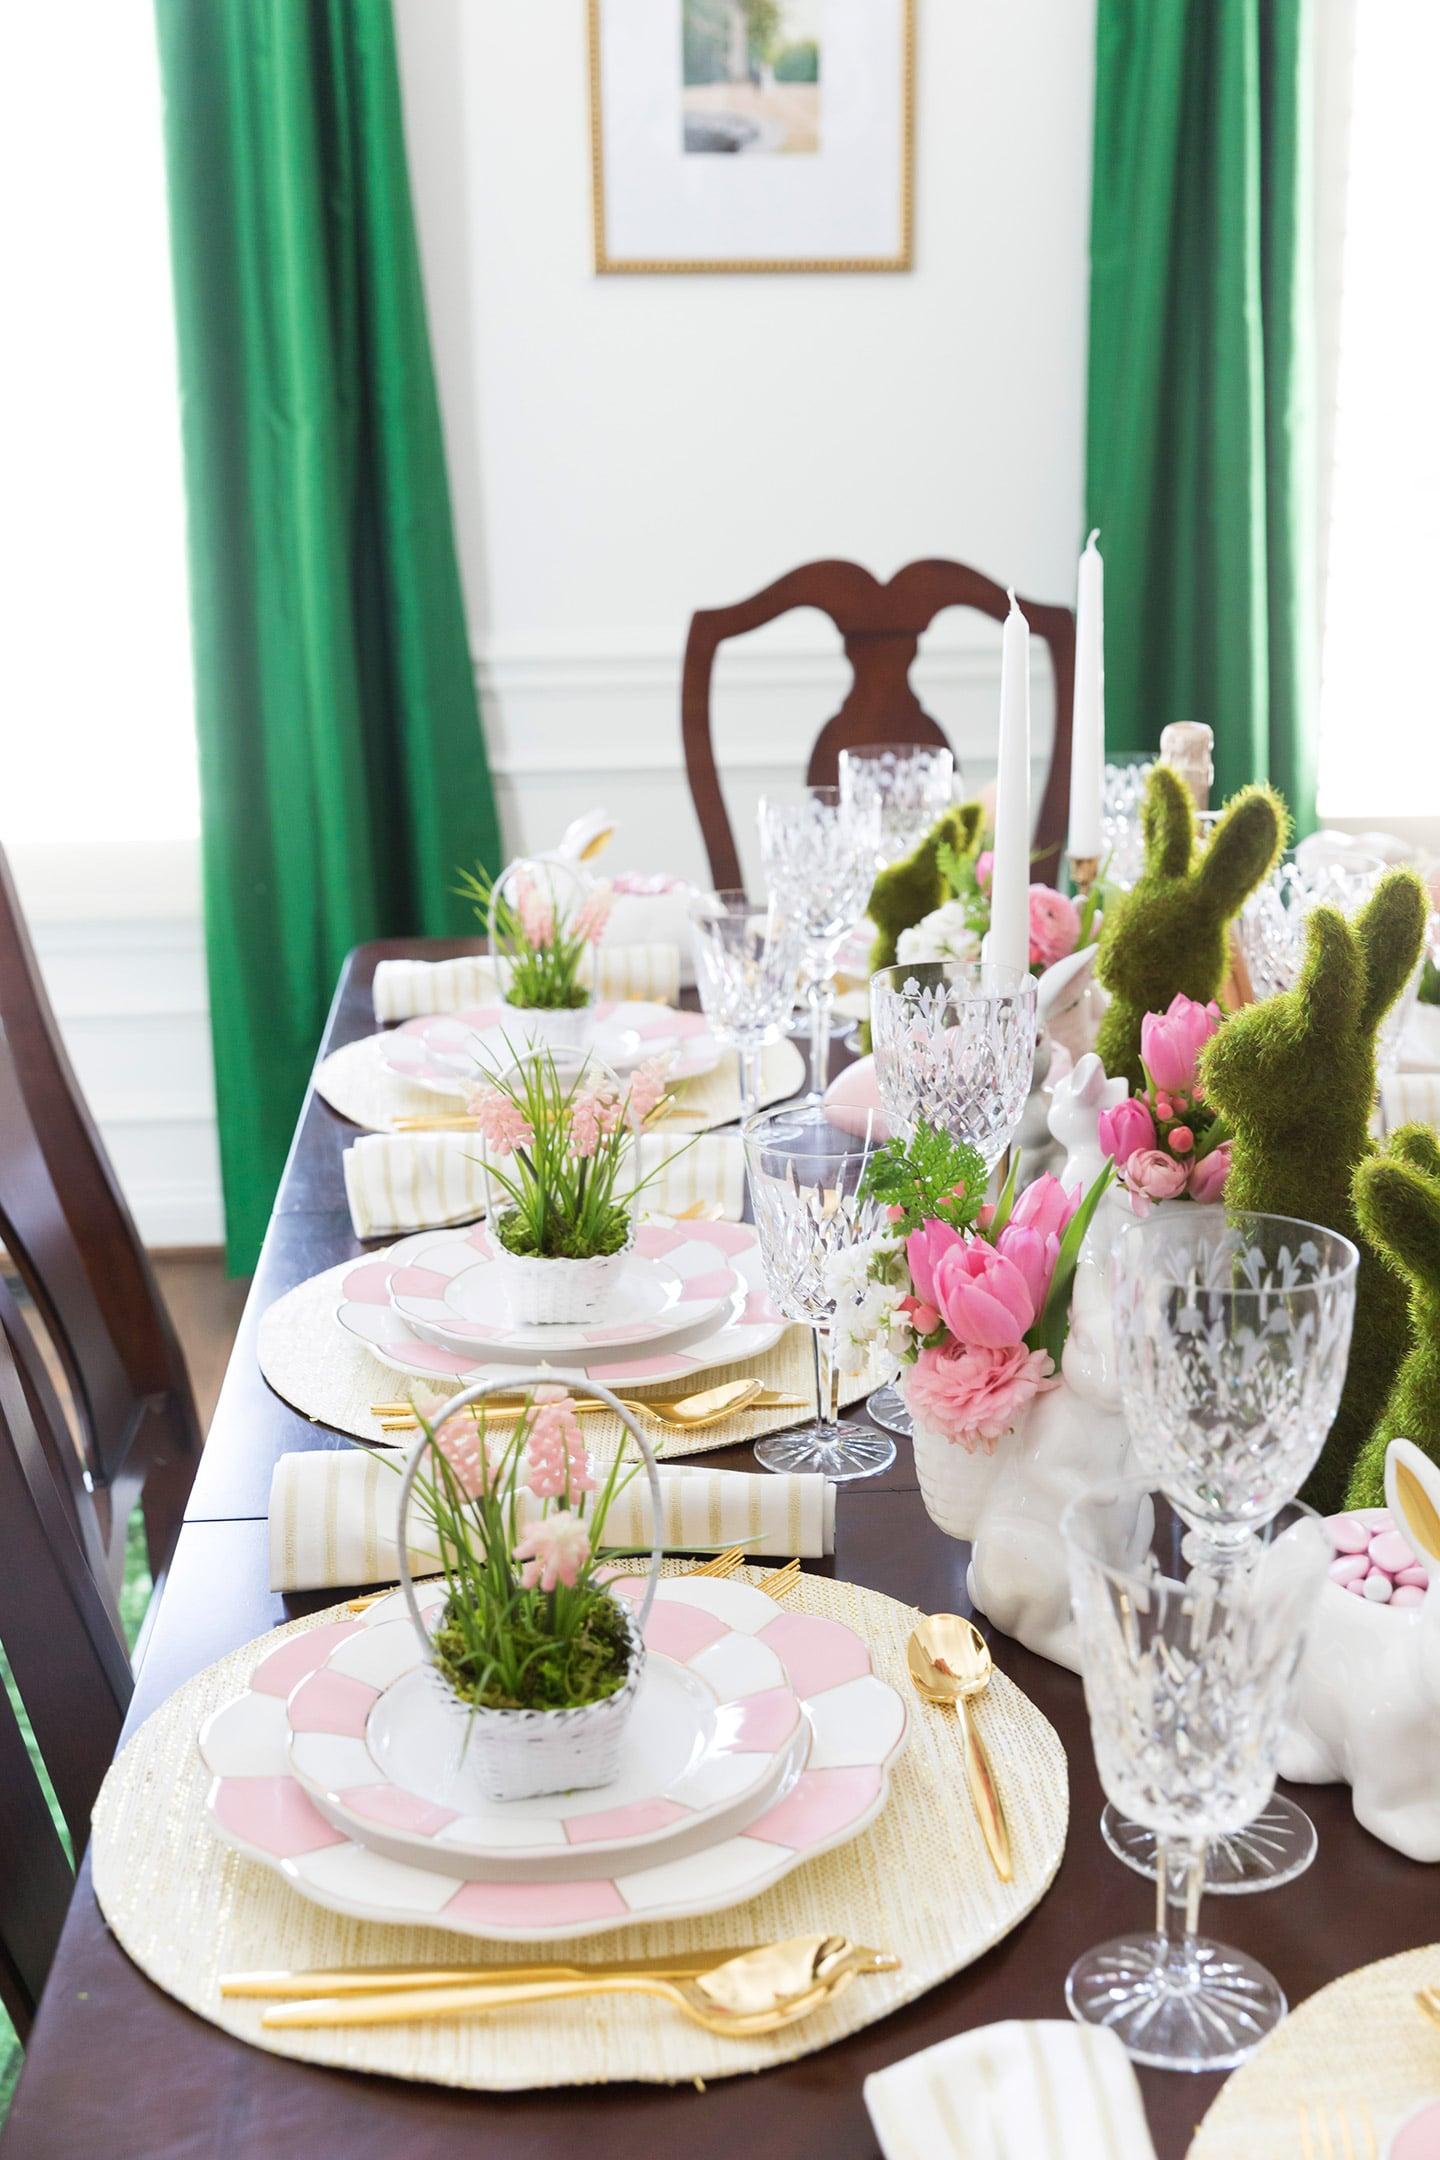 Set a gorgeous Easter Tablescape & Easter Table Decorations \u0026 Place Setting Ideas! | Pizzazzerie